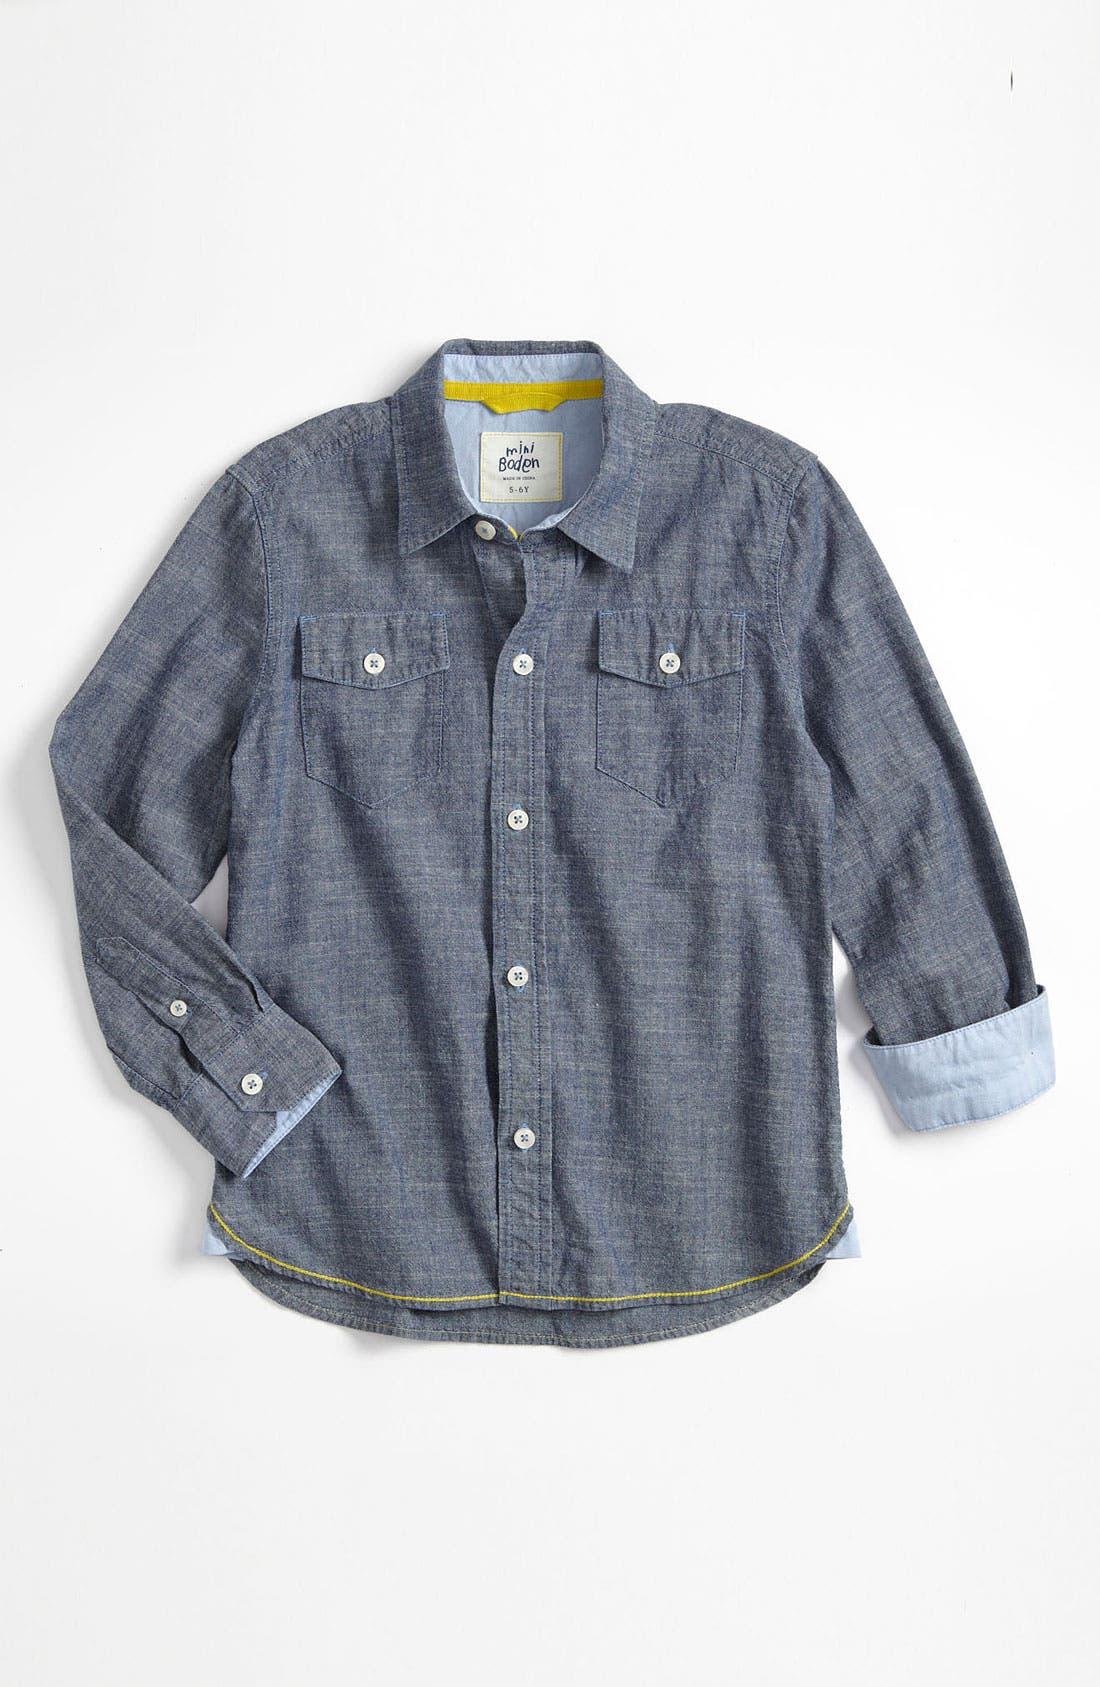 Alternate Image 1 Selected - Mini Boden 'Everyday' Woven Shirt (Little Boys & Big Boys)